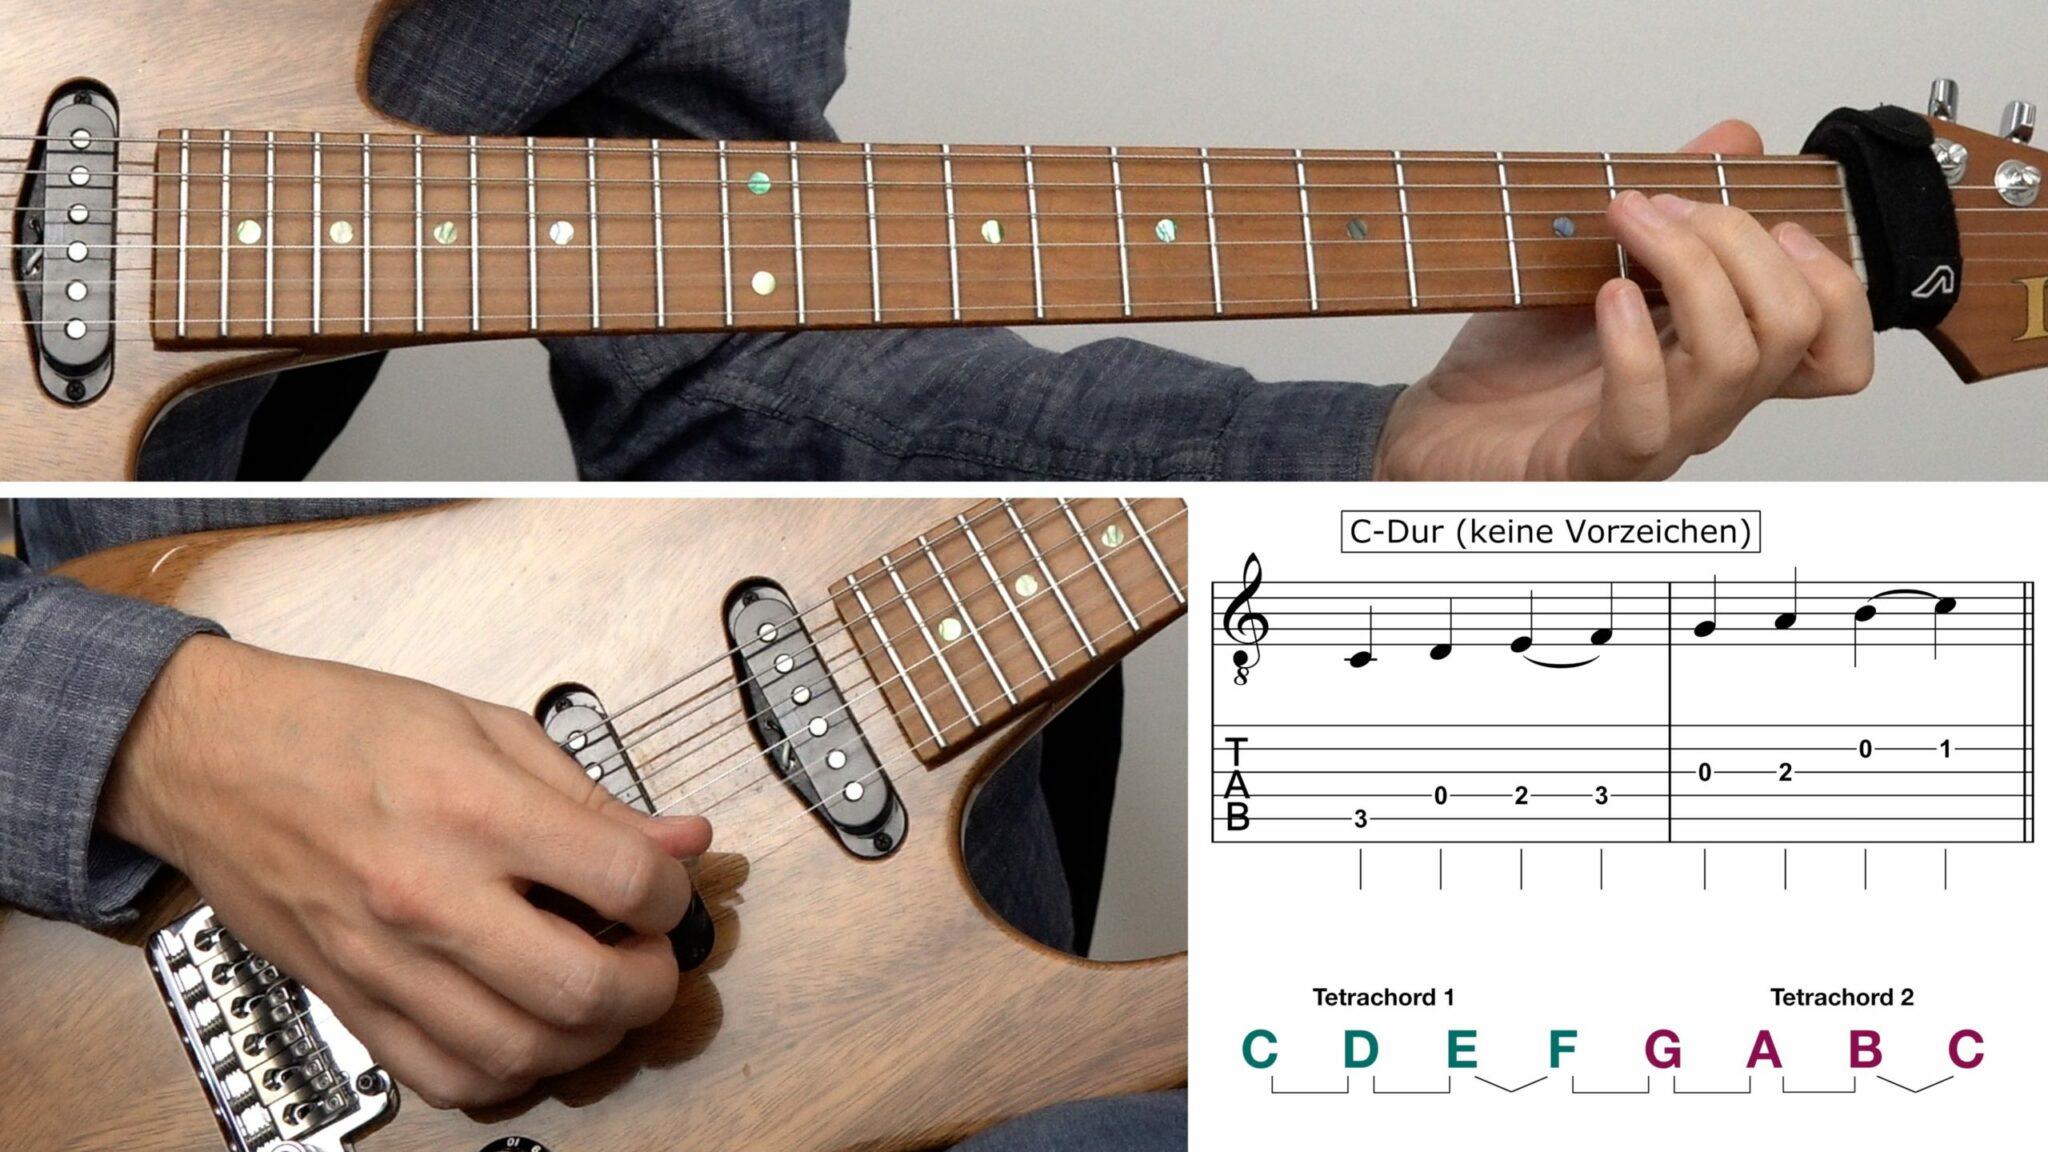 Theorie Gitarre lernen online C-Dur